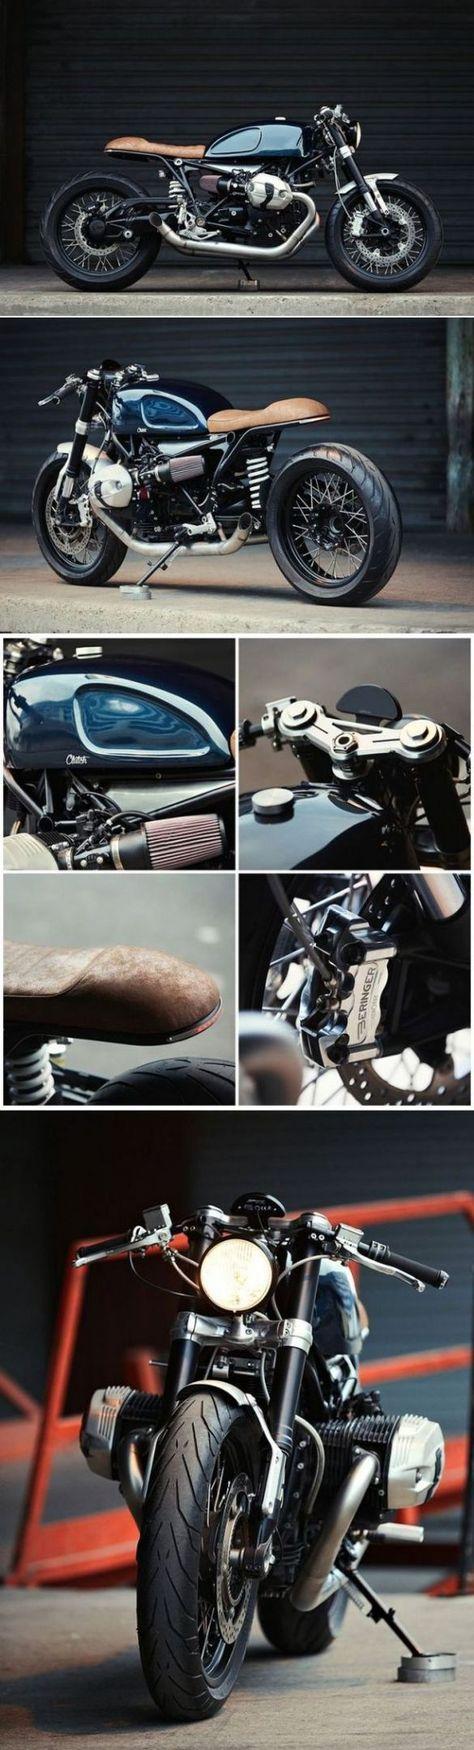 56 bmw cafe racer photography ideas – We Otomotive Info